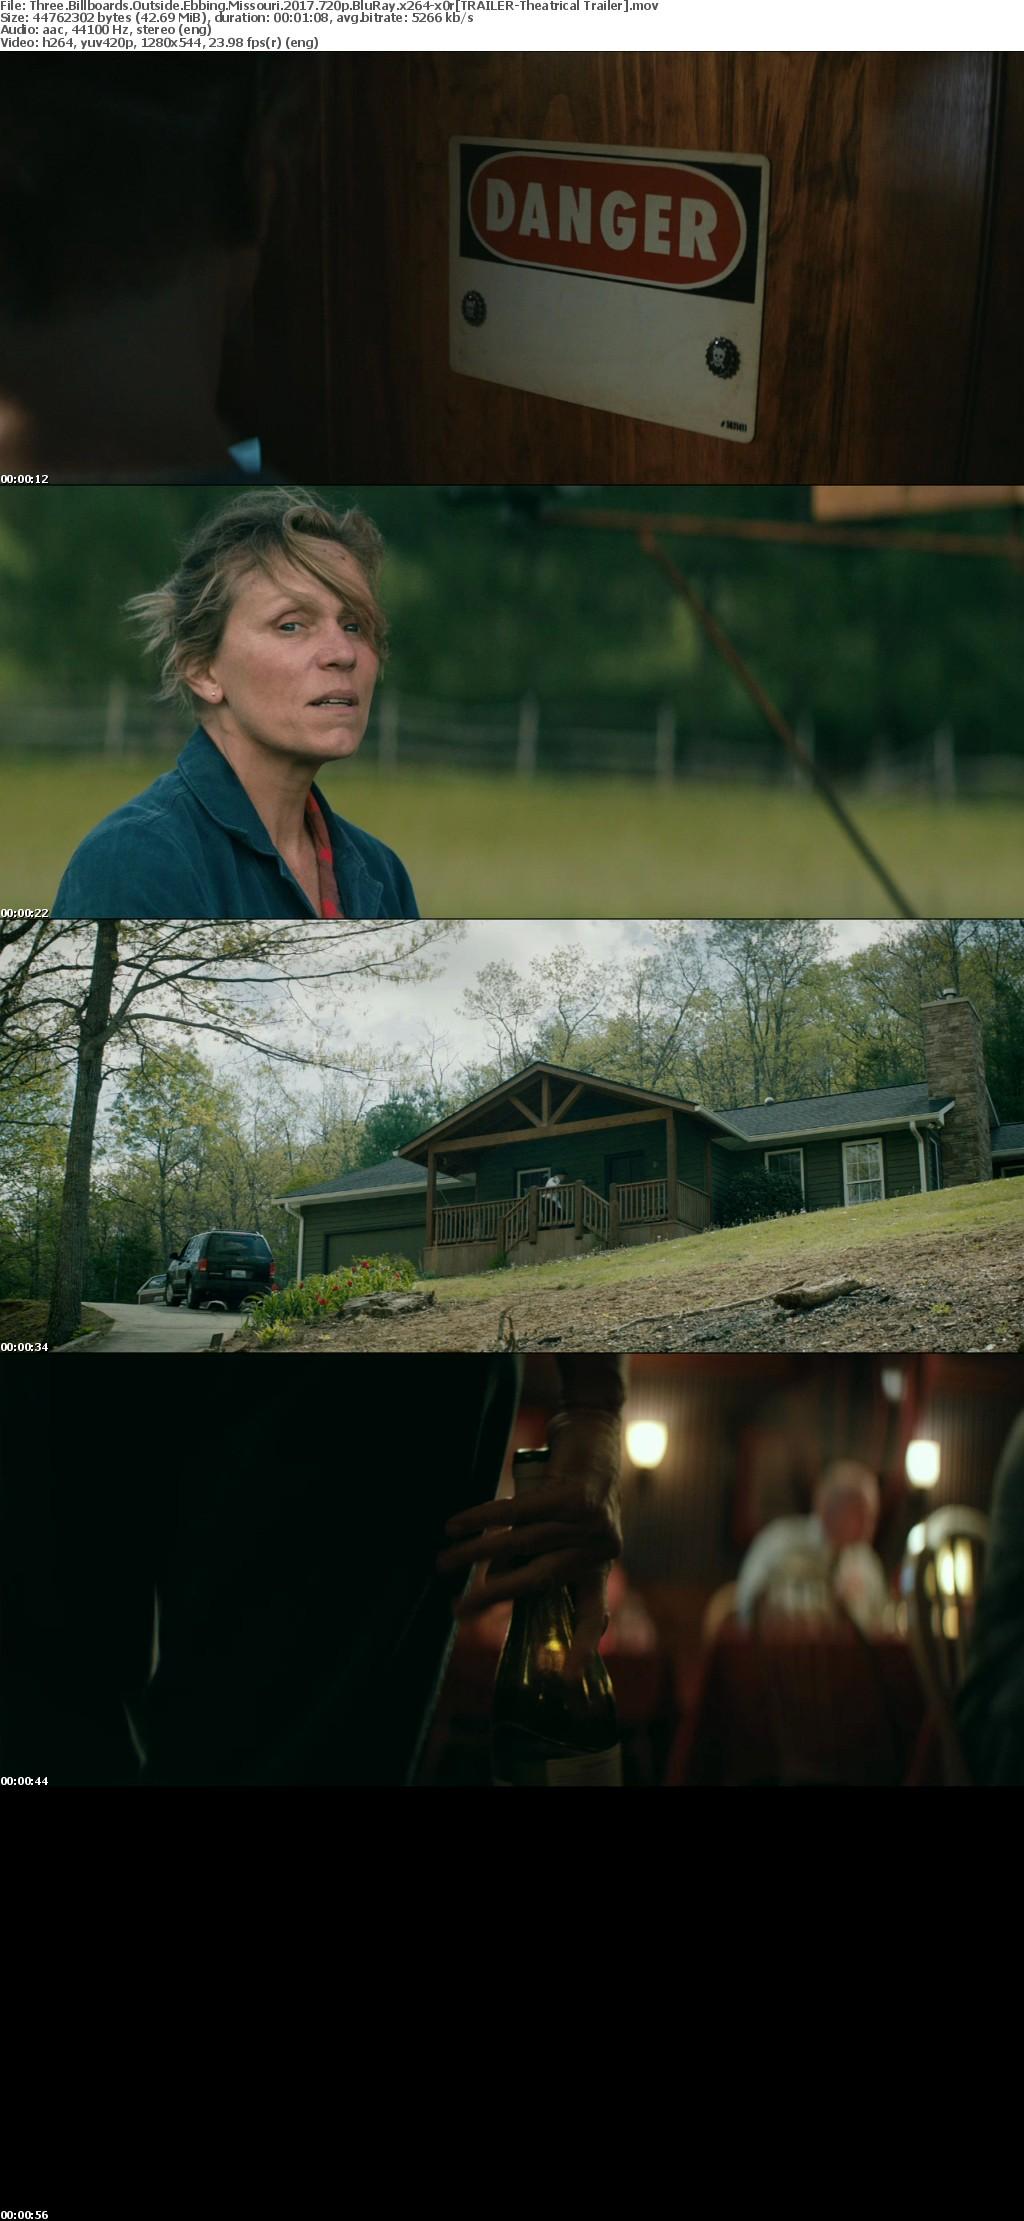 Three Billboards Outside Ebbing Missouri 2017 720p BluRay x264-x0r